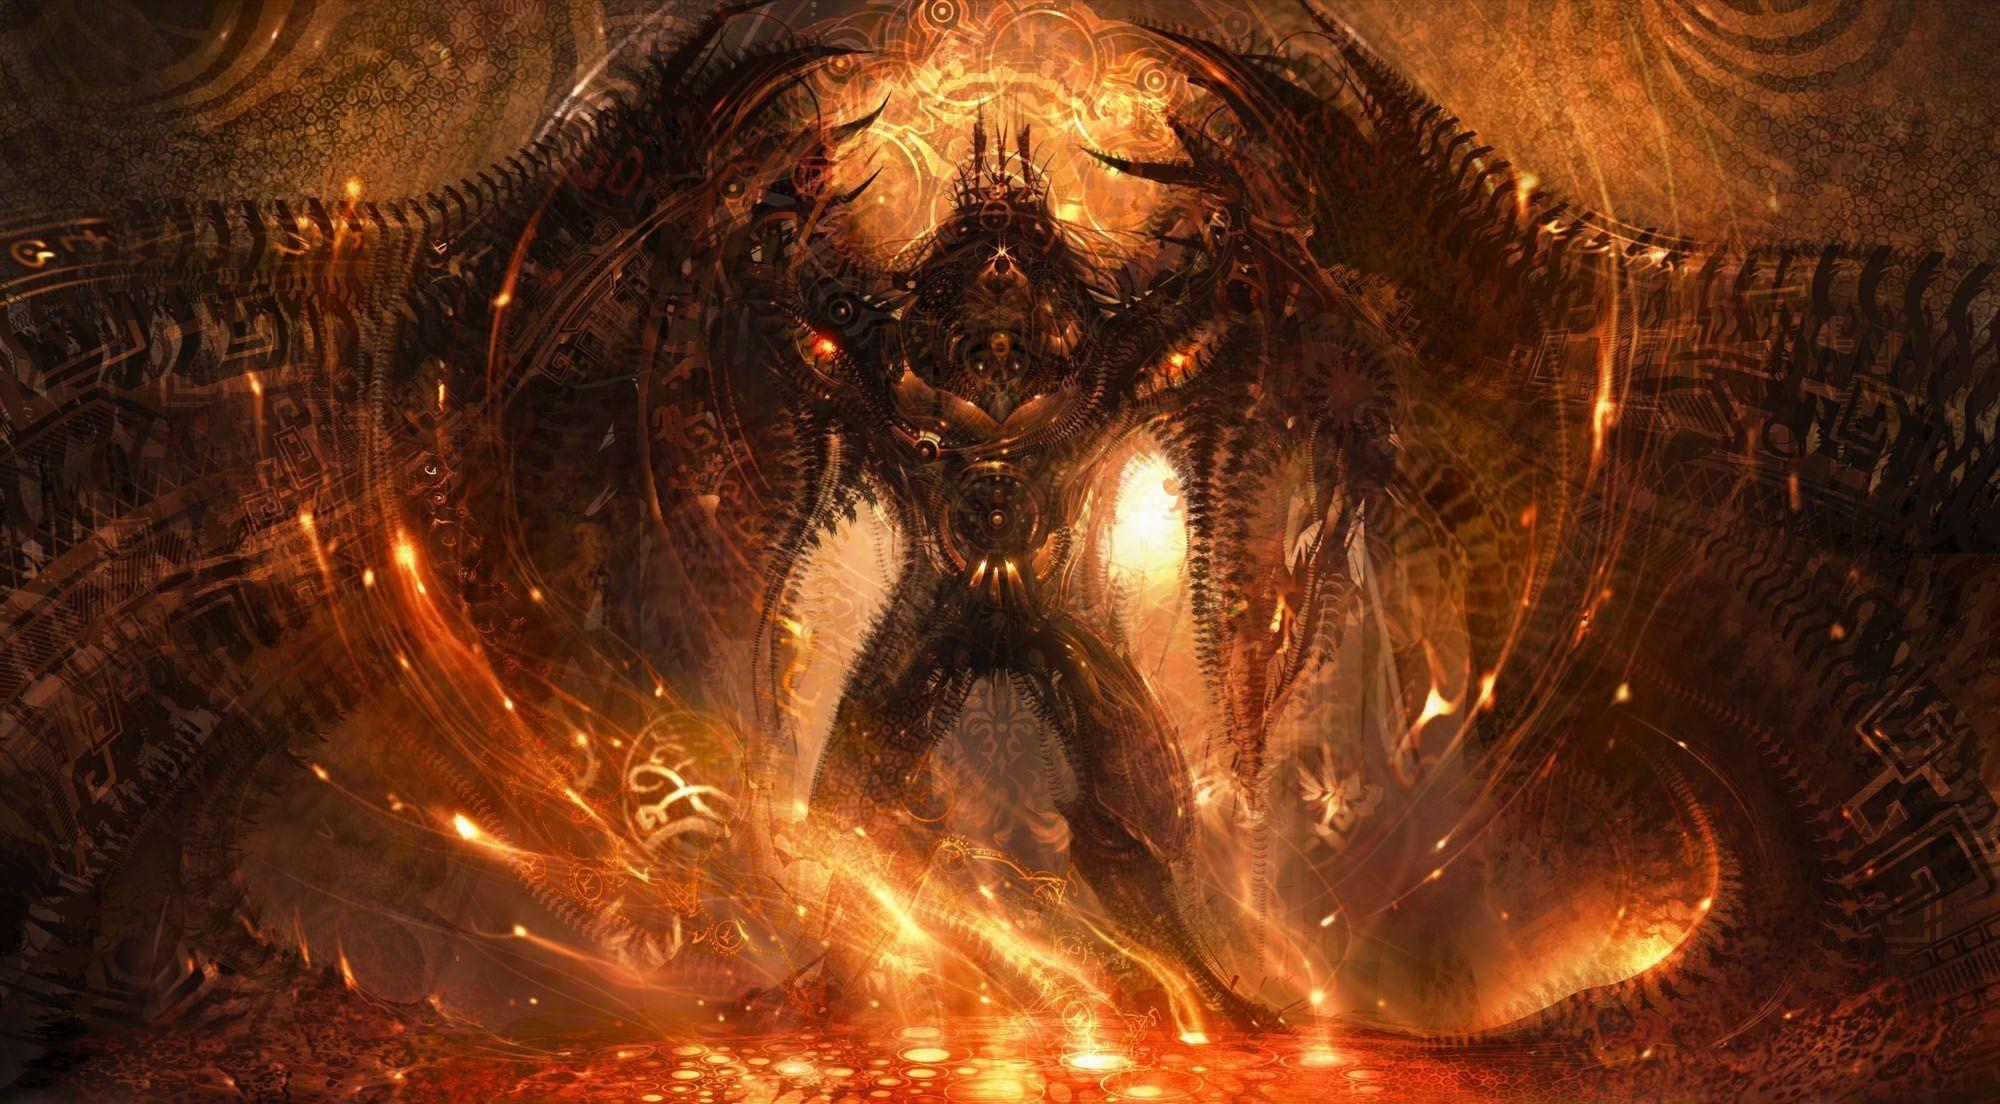 285 Demon HD Wallpapers